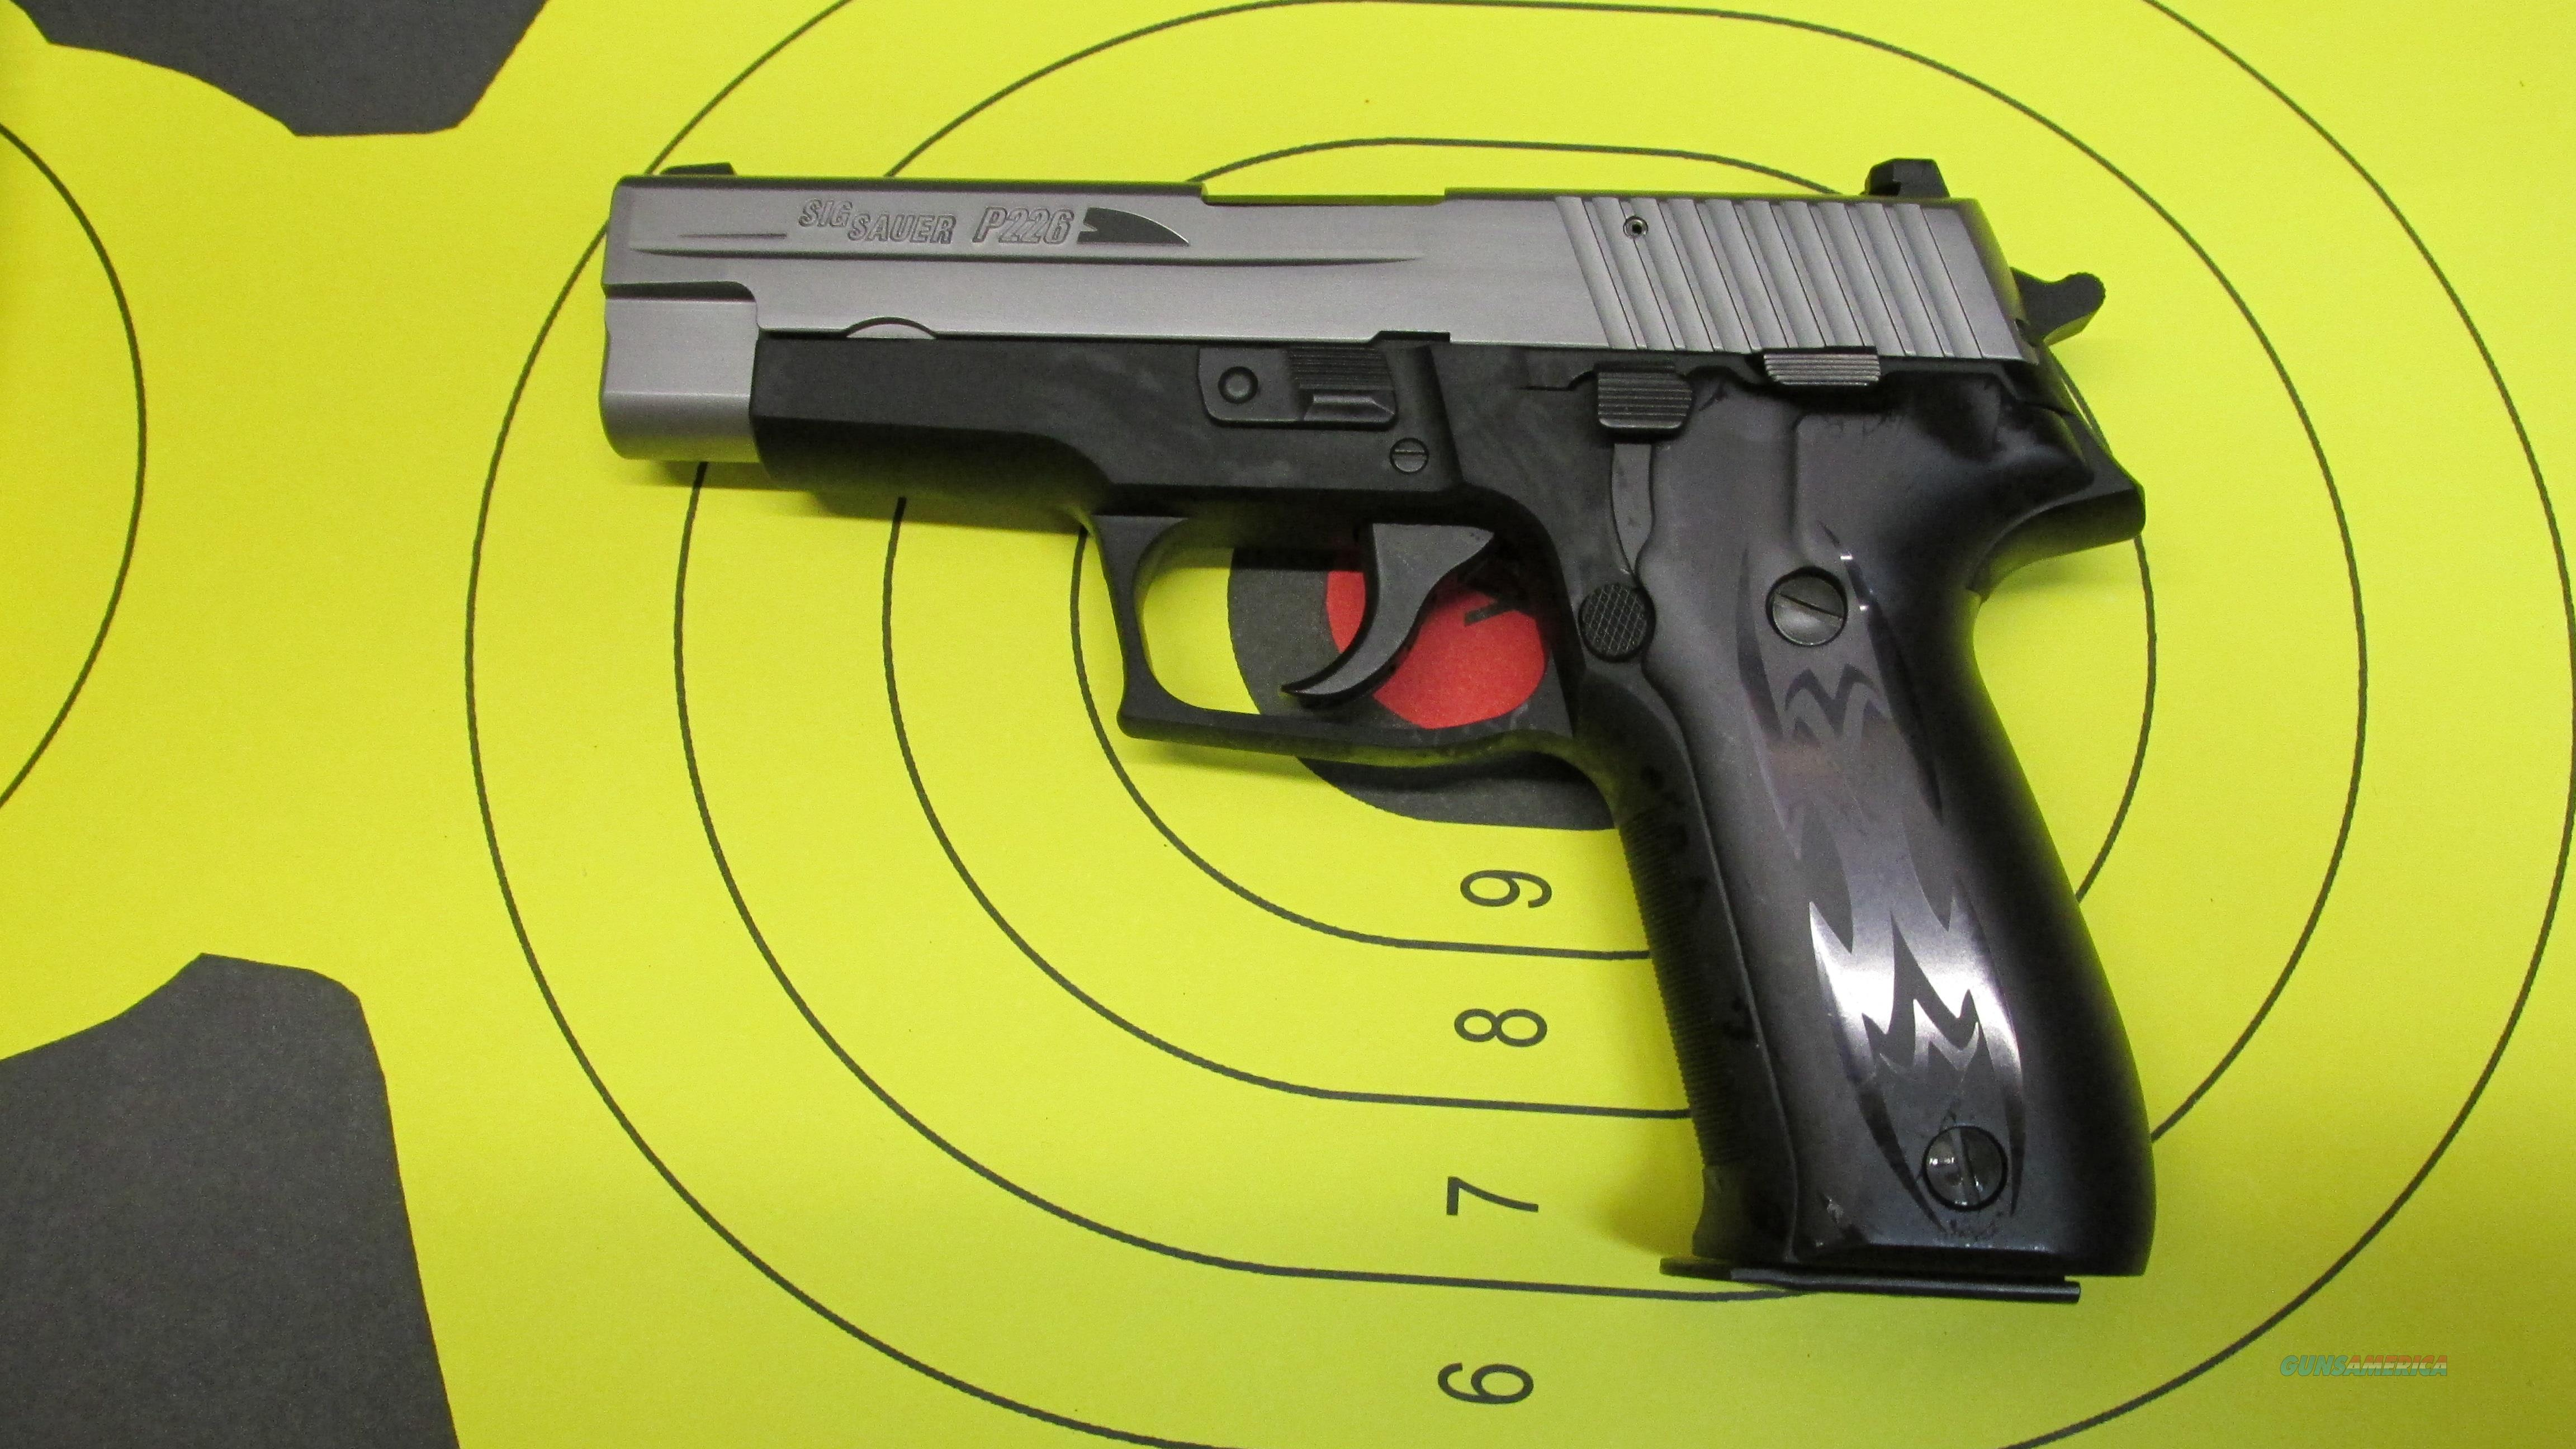 "SIG SAUER P226 TRIBAL 9MM 4.4"" BARREL 15 ROUND MAGAZINE (2)  Guns > Pistols > Sig - Sauer/Sigarms Pistols > P226"